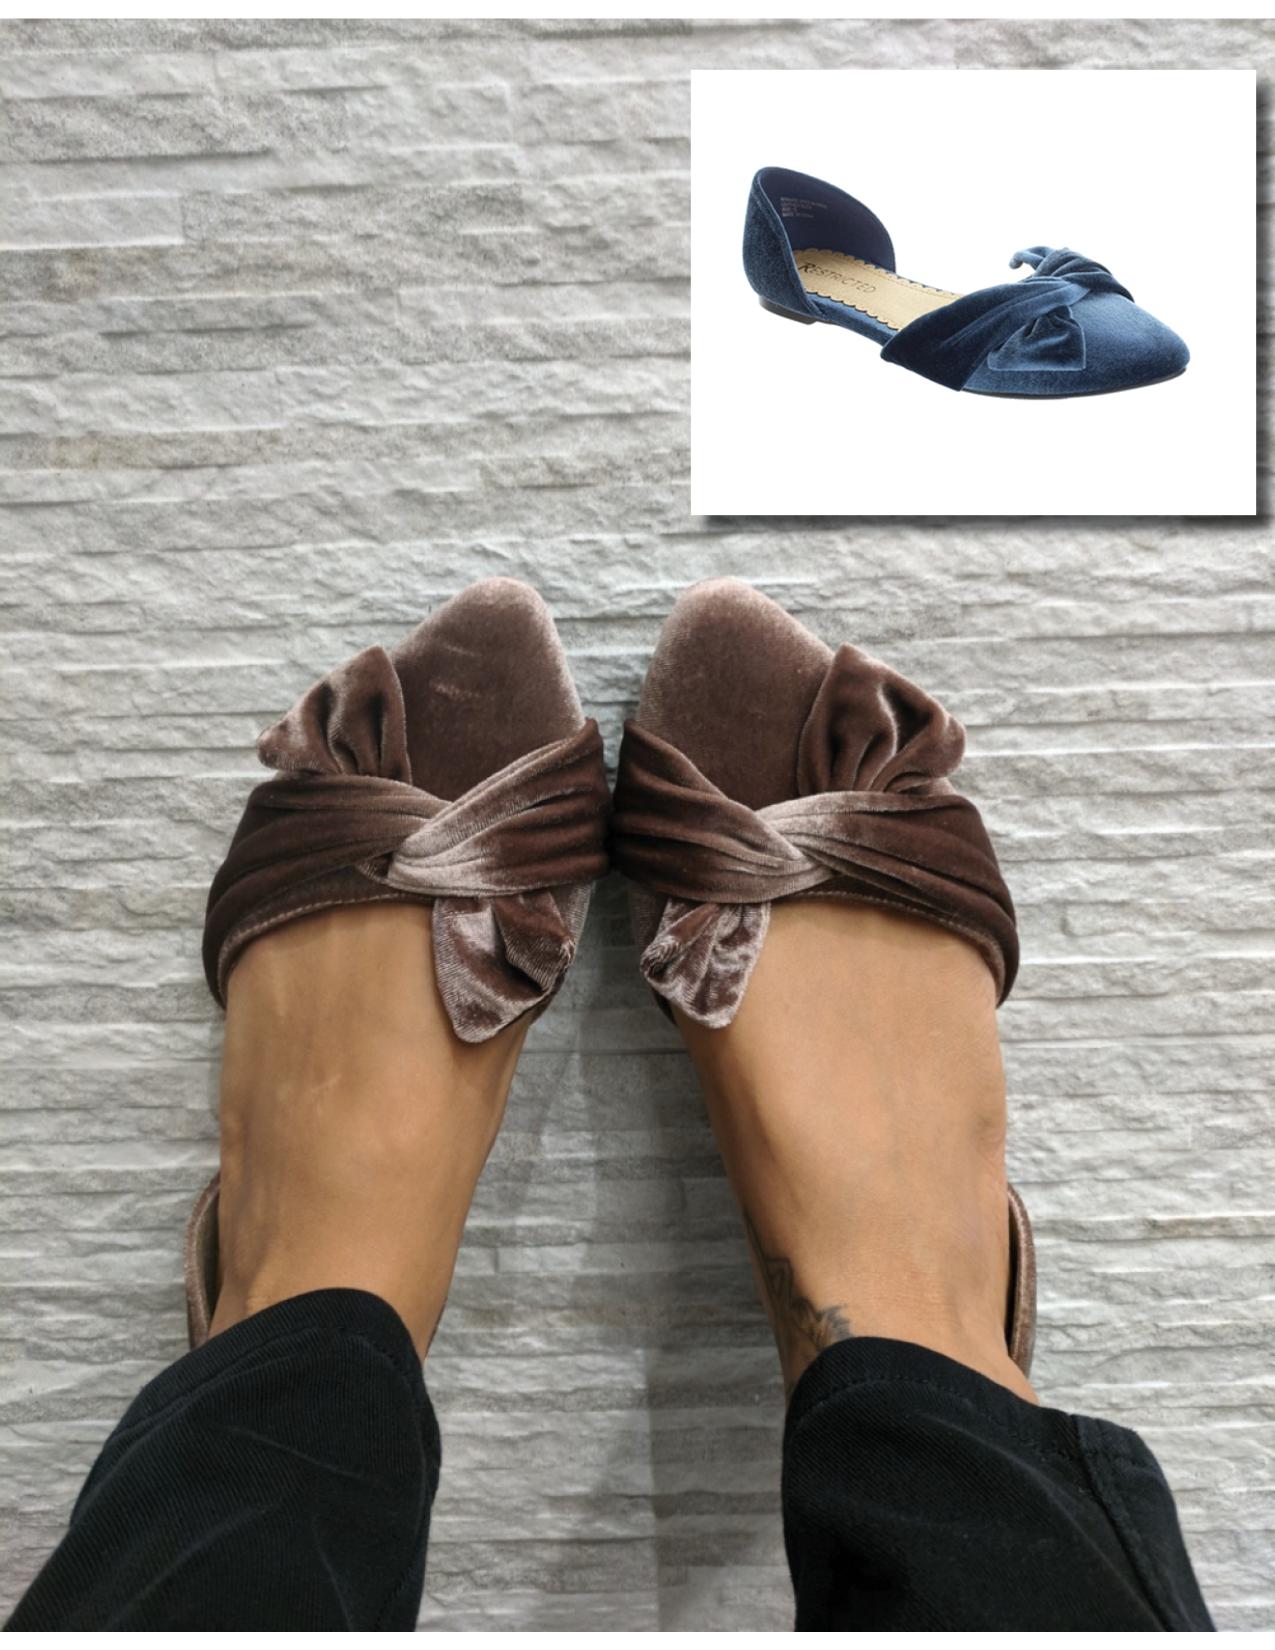 velvet_shoes.png